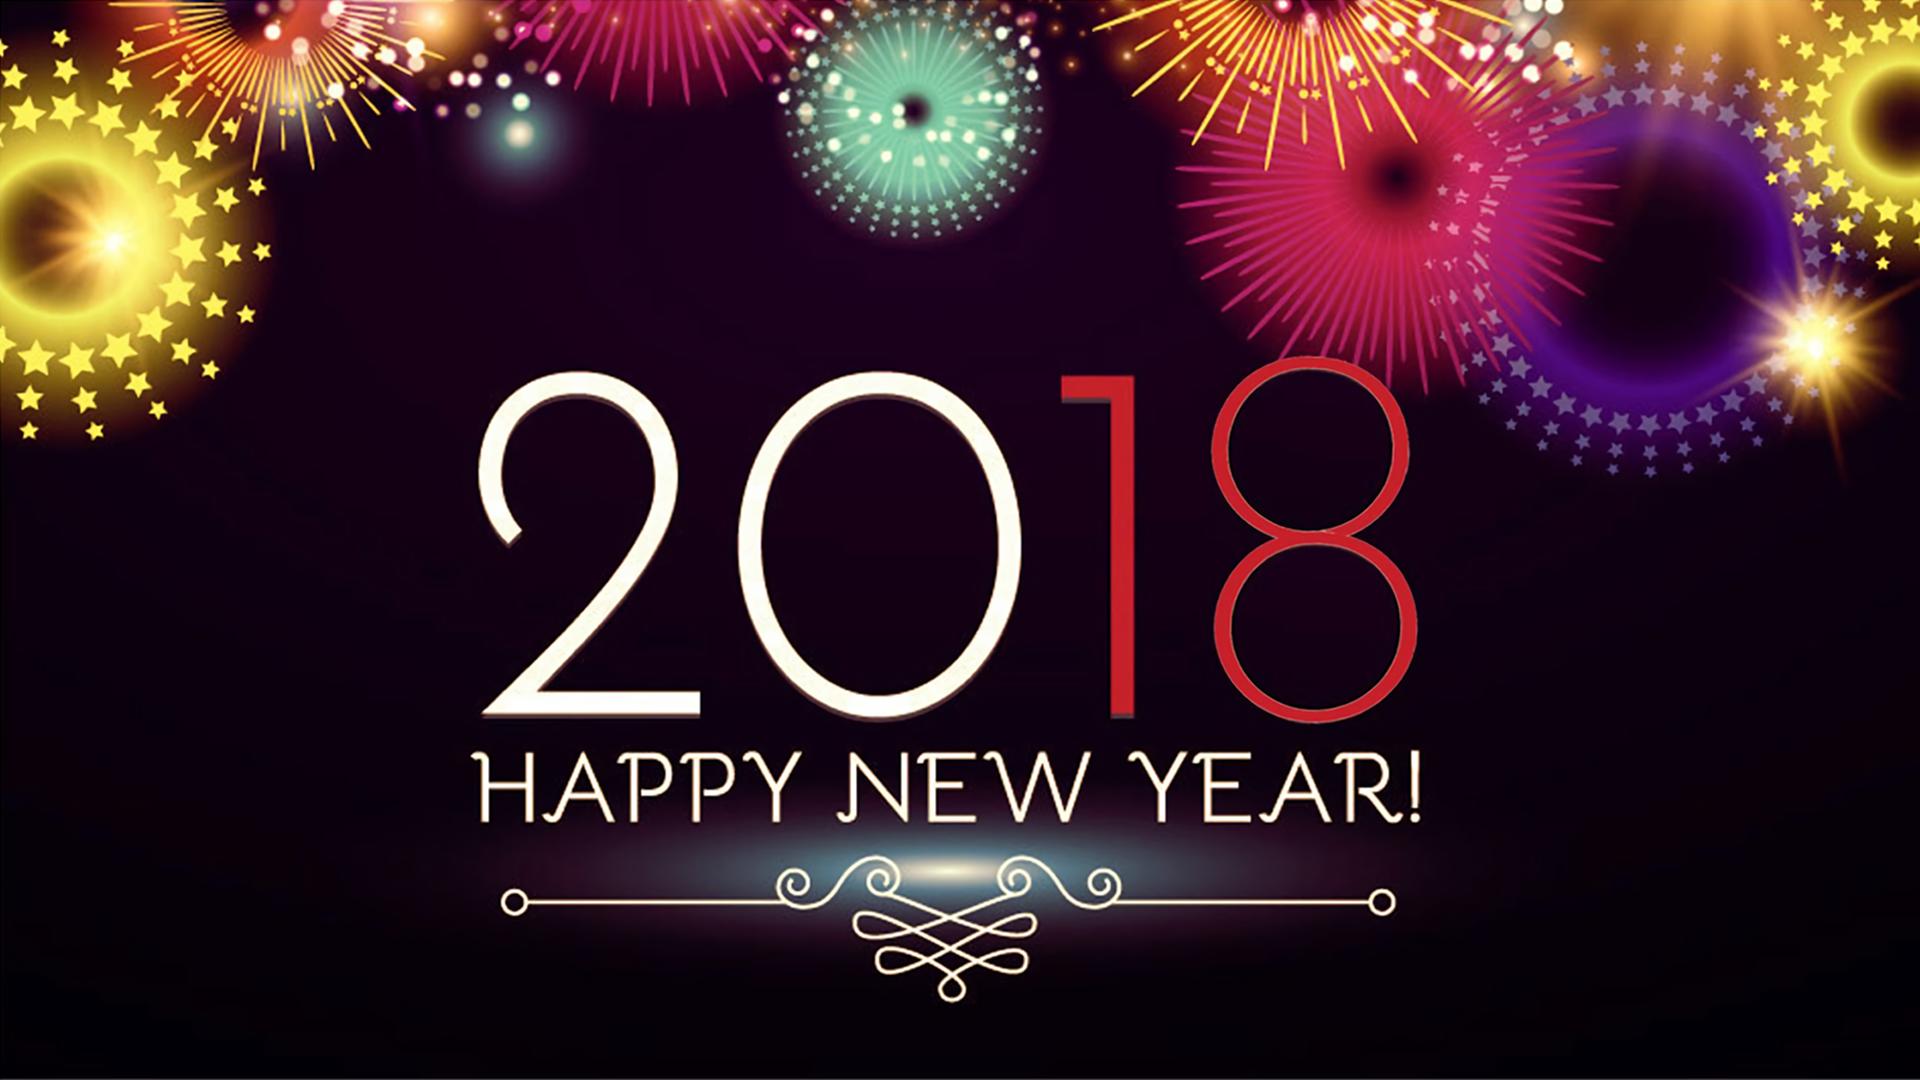 New Year 2018 HD Wallpaper.